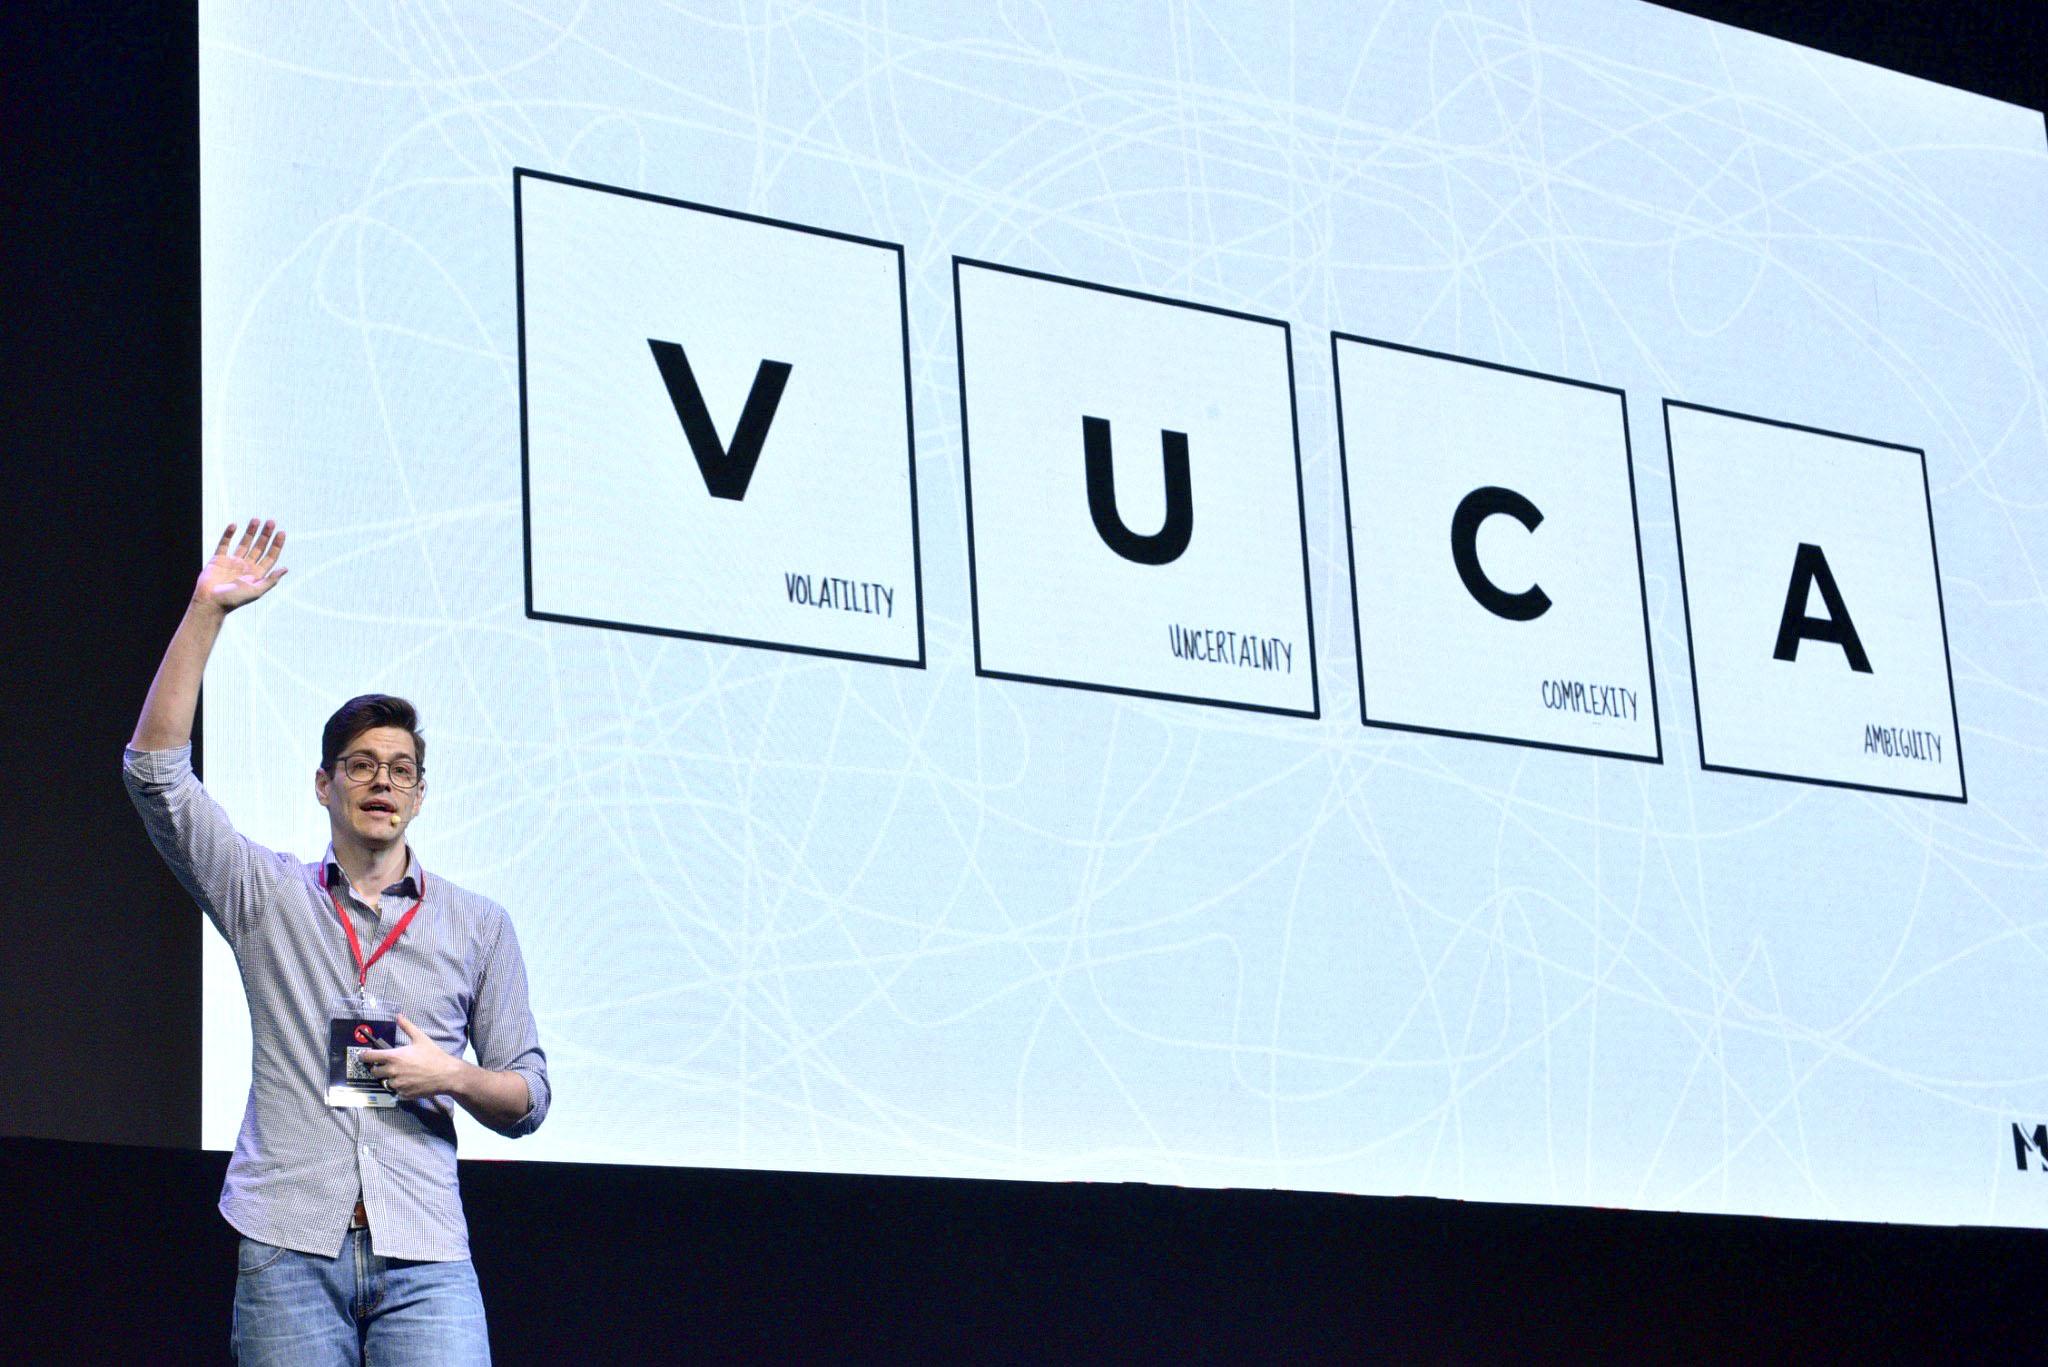 Today & the future of customer experience. VUCA.